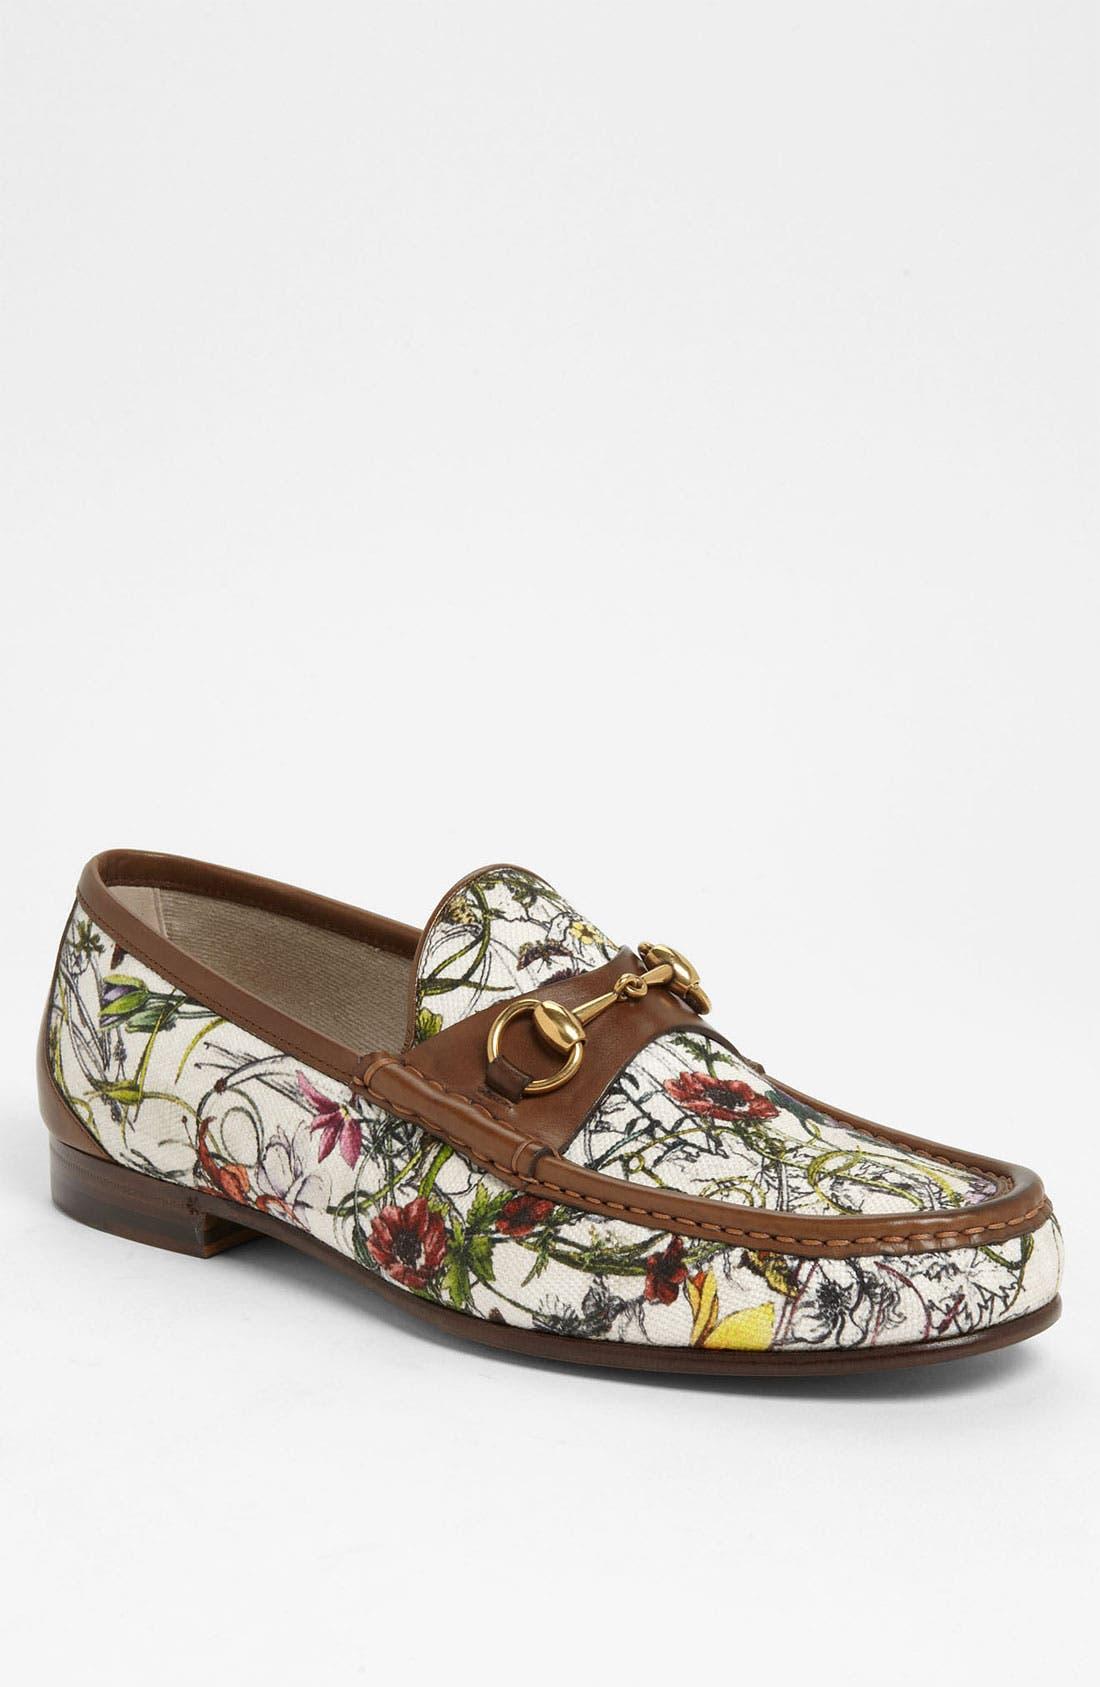 Alternate Image 1 Selected - Gucci 'Roos' Floral Bit Loafer